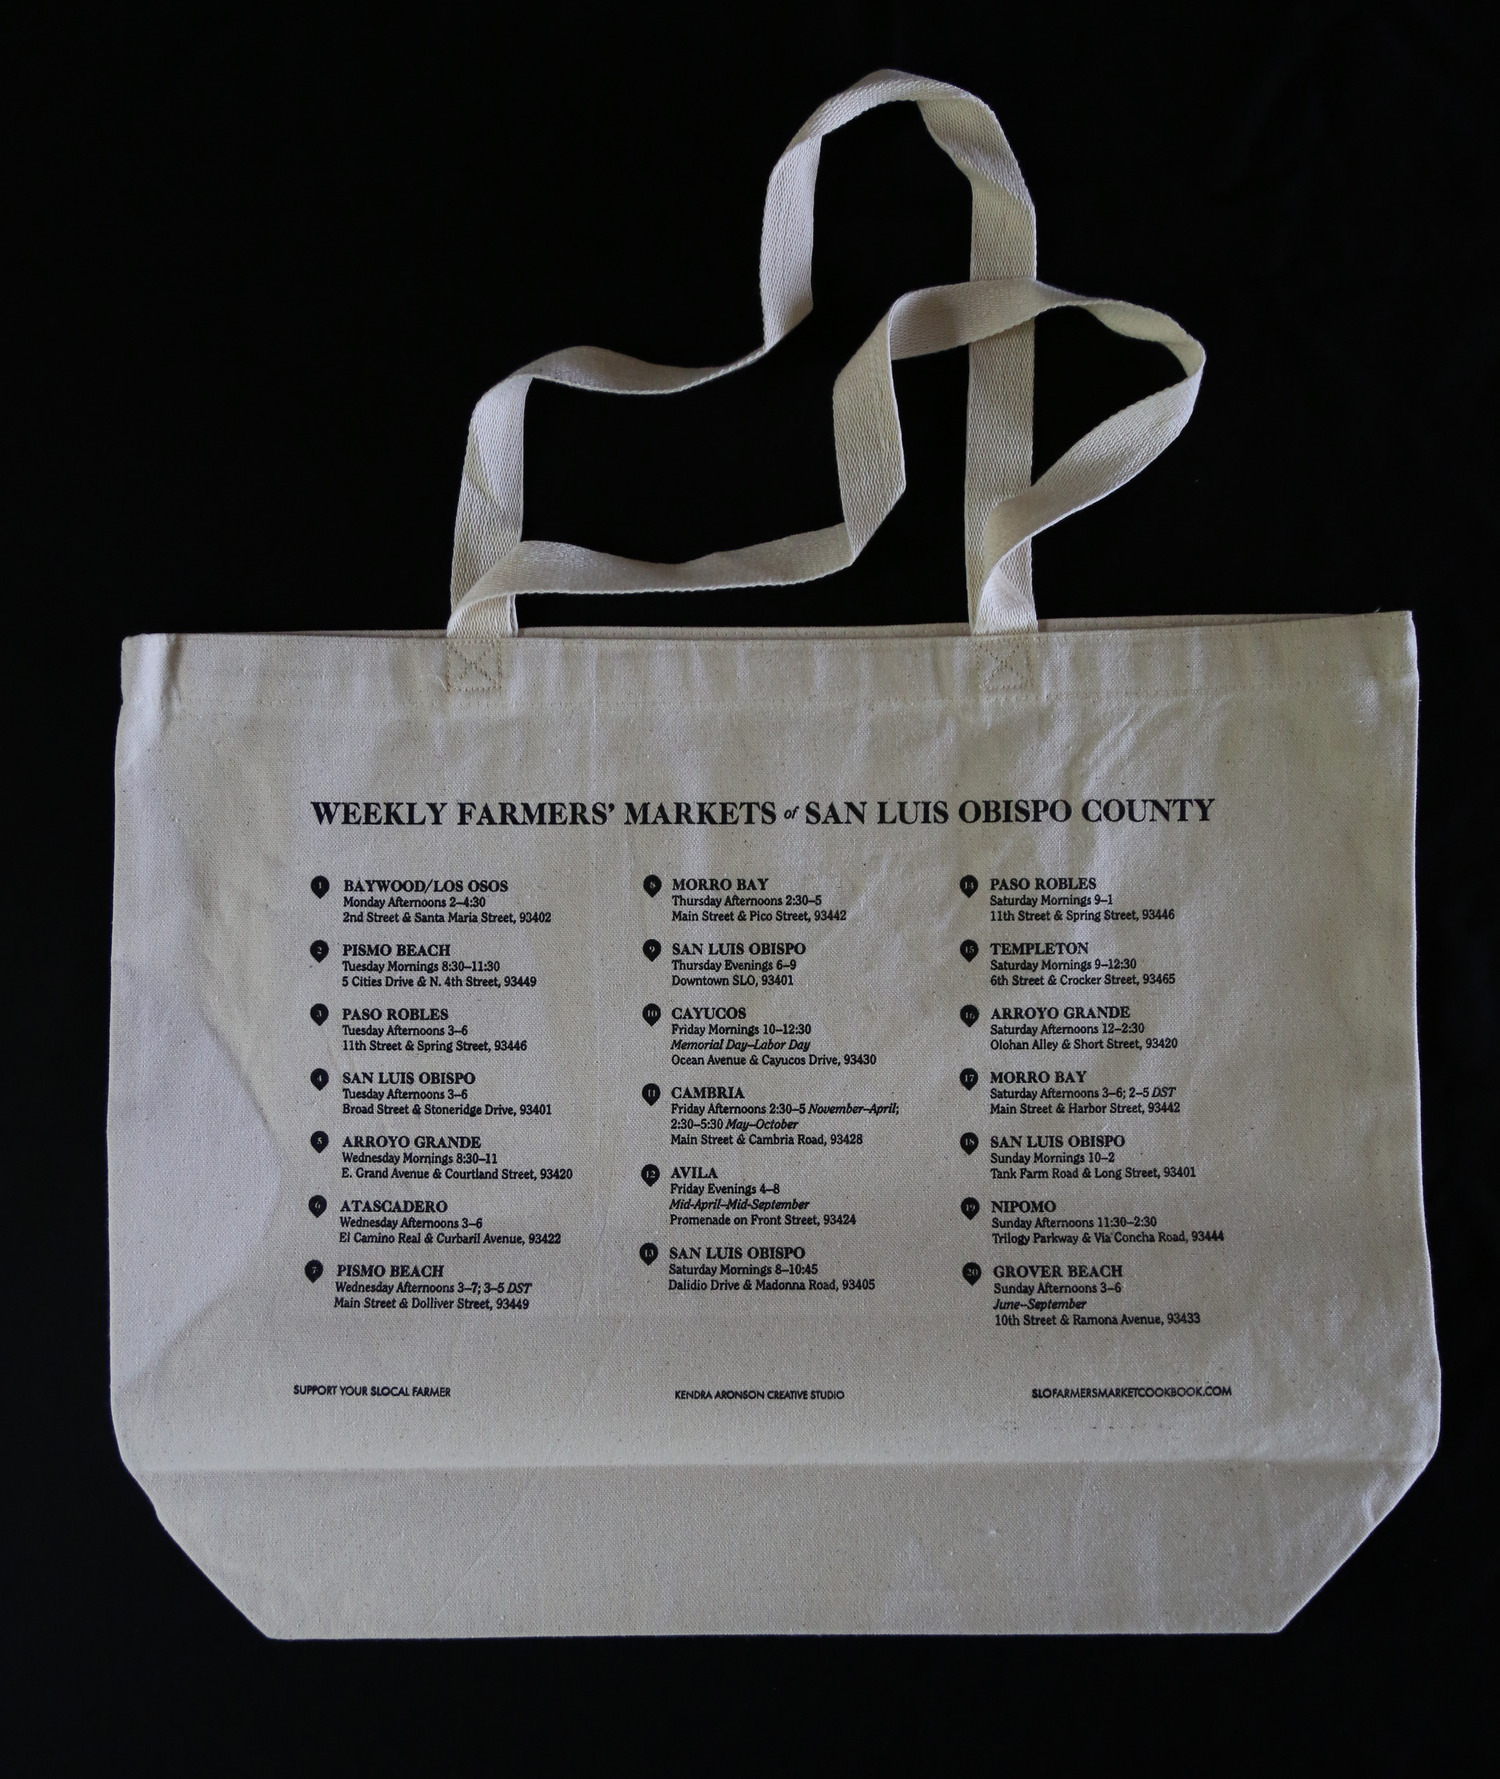 slo-farmers-market-cookbook-tote-bag.png